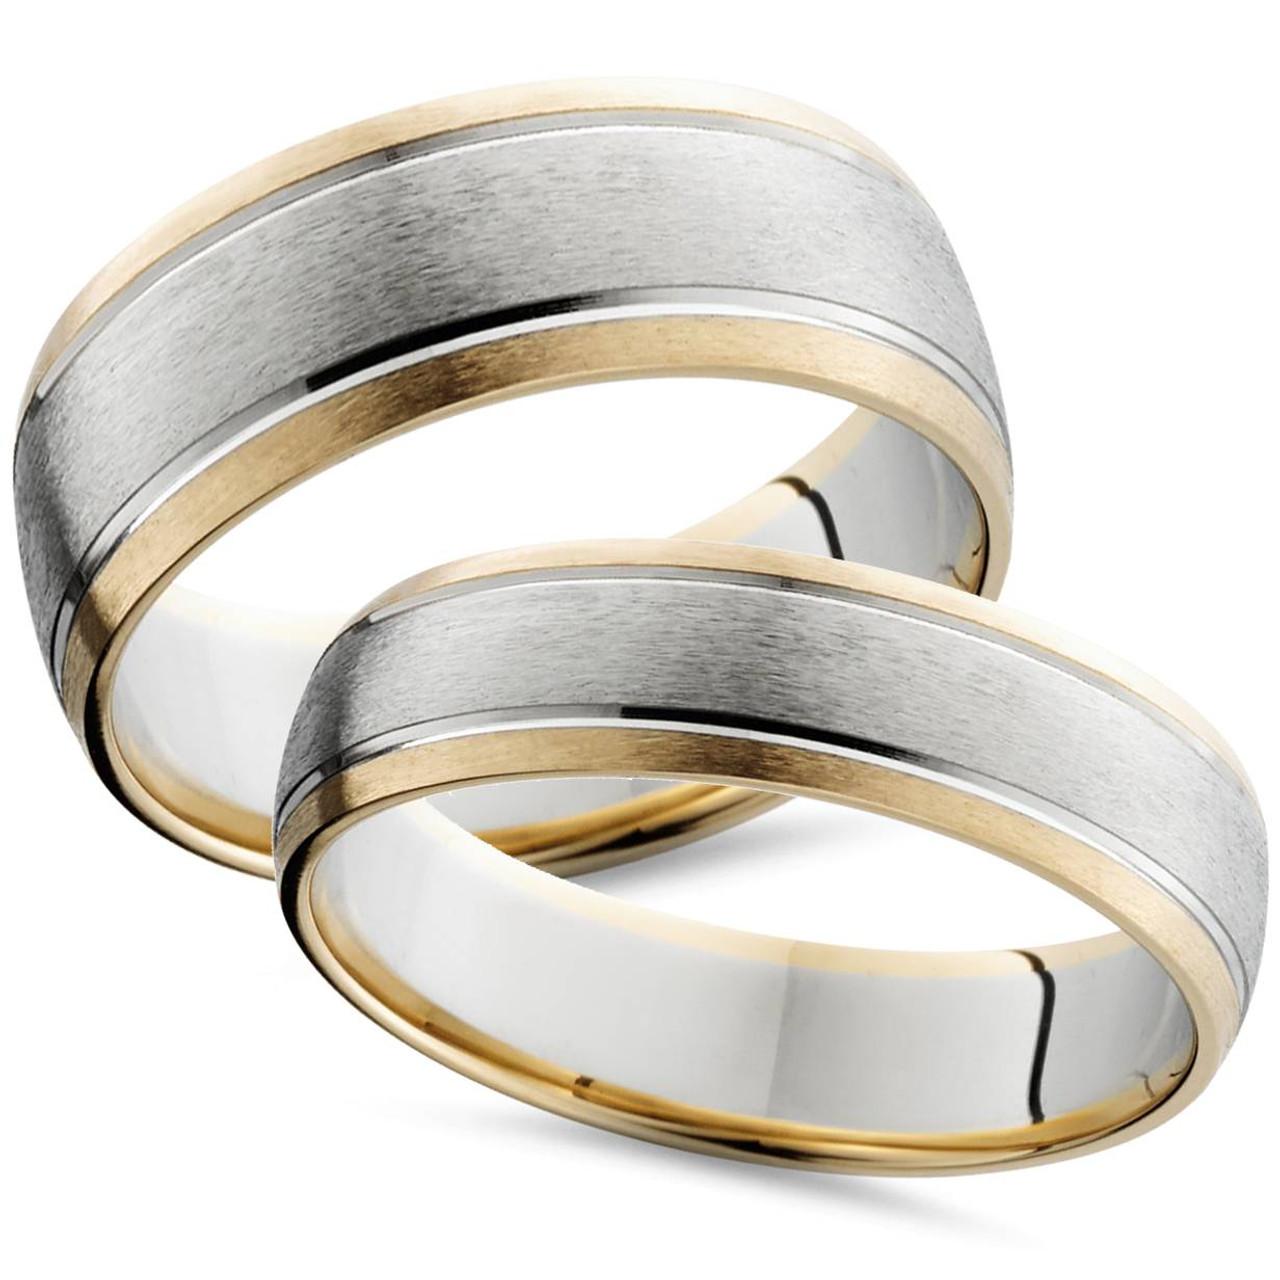 Two Tone 14k White Yellow Gold Matching Wedding Ring Set His Hers